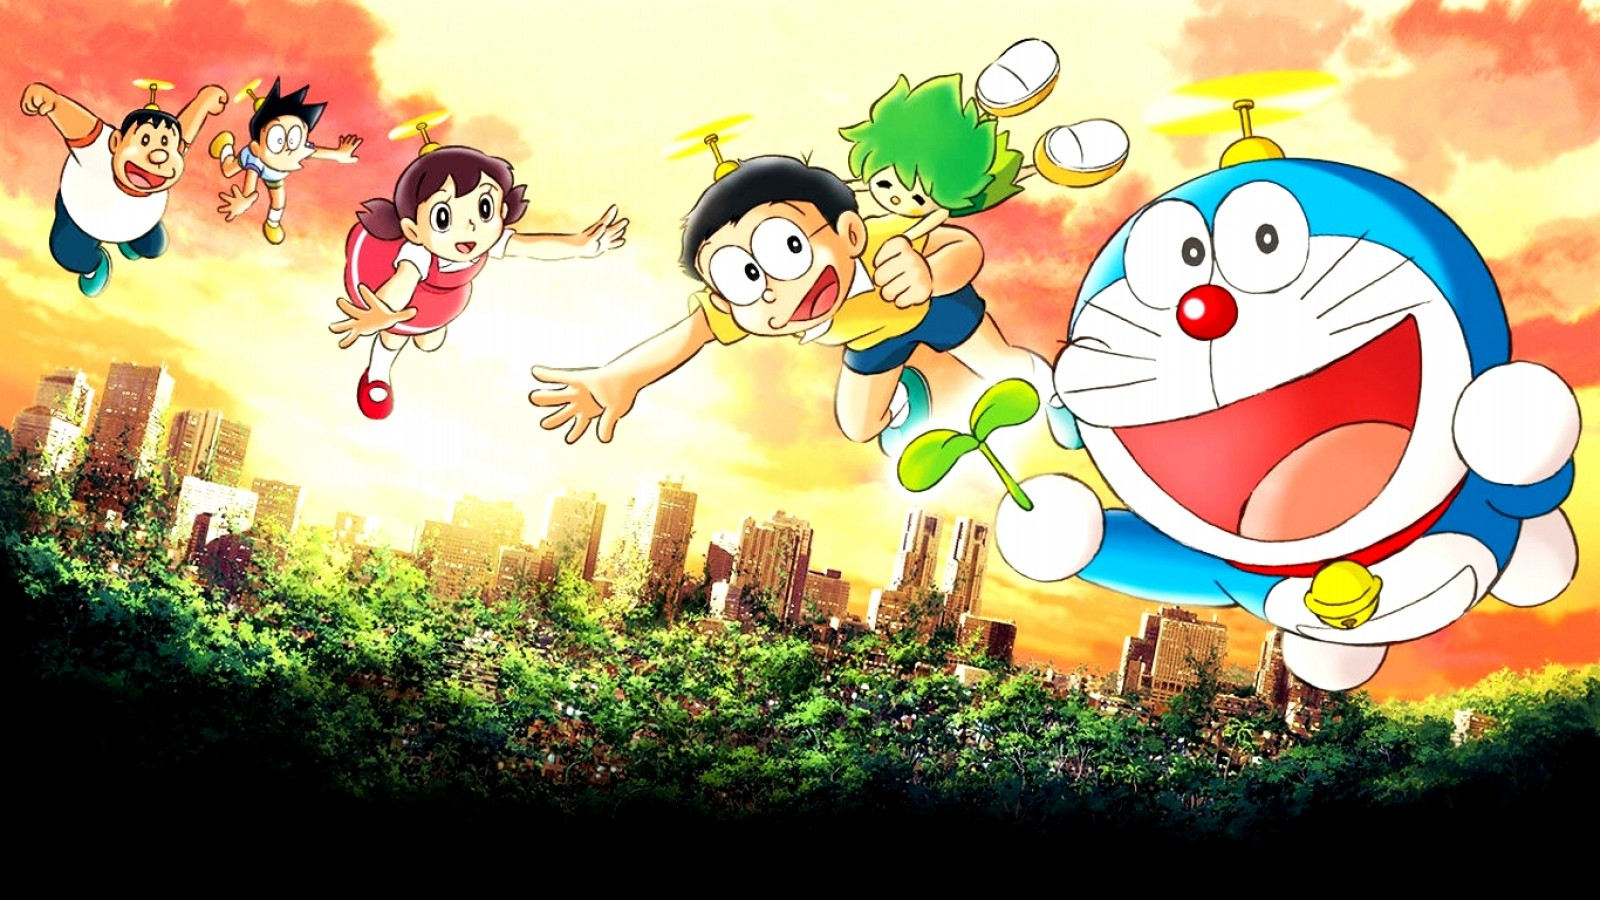 Doraemon Wallpapers Top Free Doraemon Backgrounds Wallpaperaccess